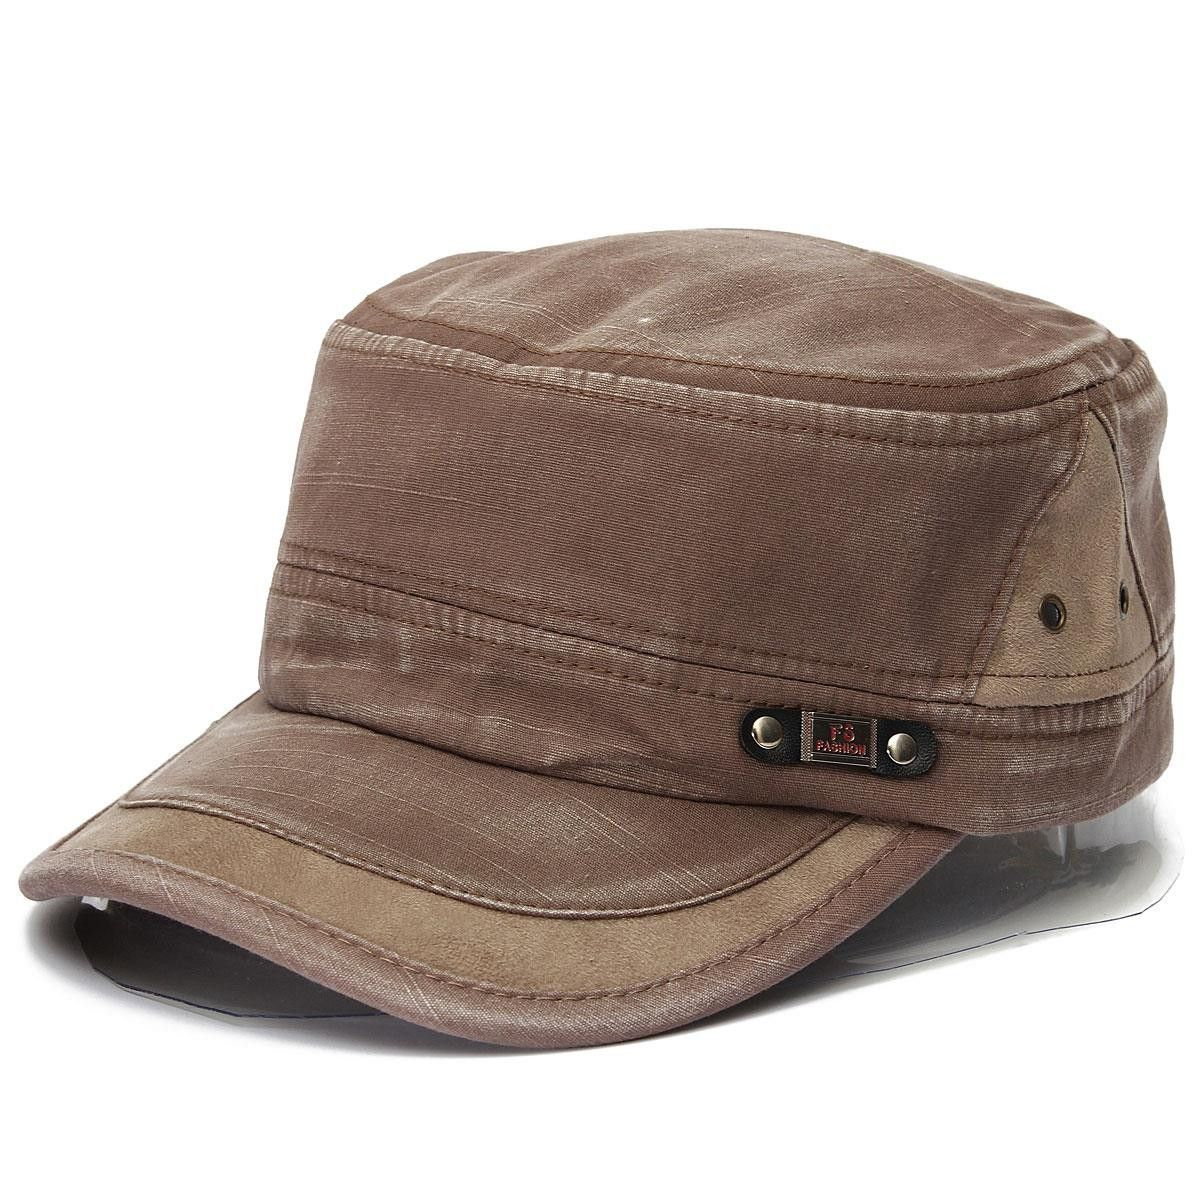 Unisex Vintage Military Washed Cadet Cap Hat Army Castro Plain Flat Baseball